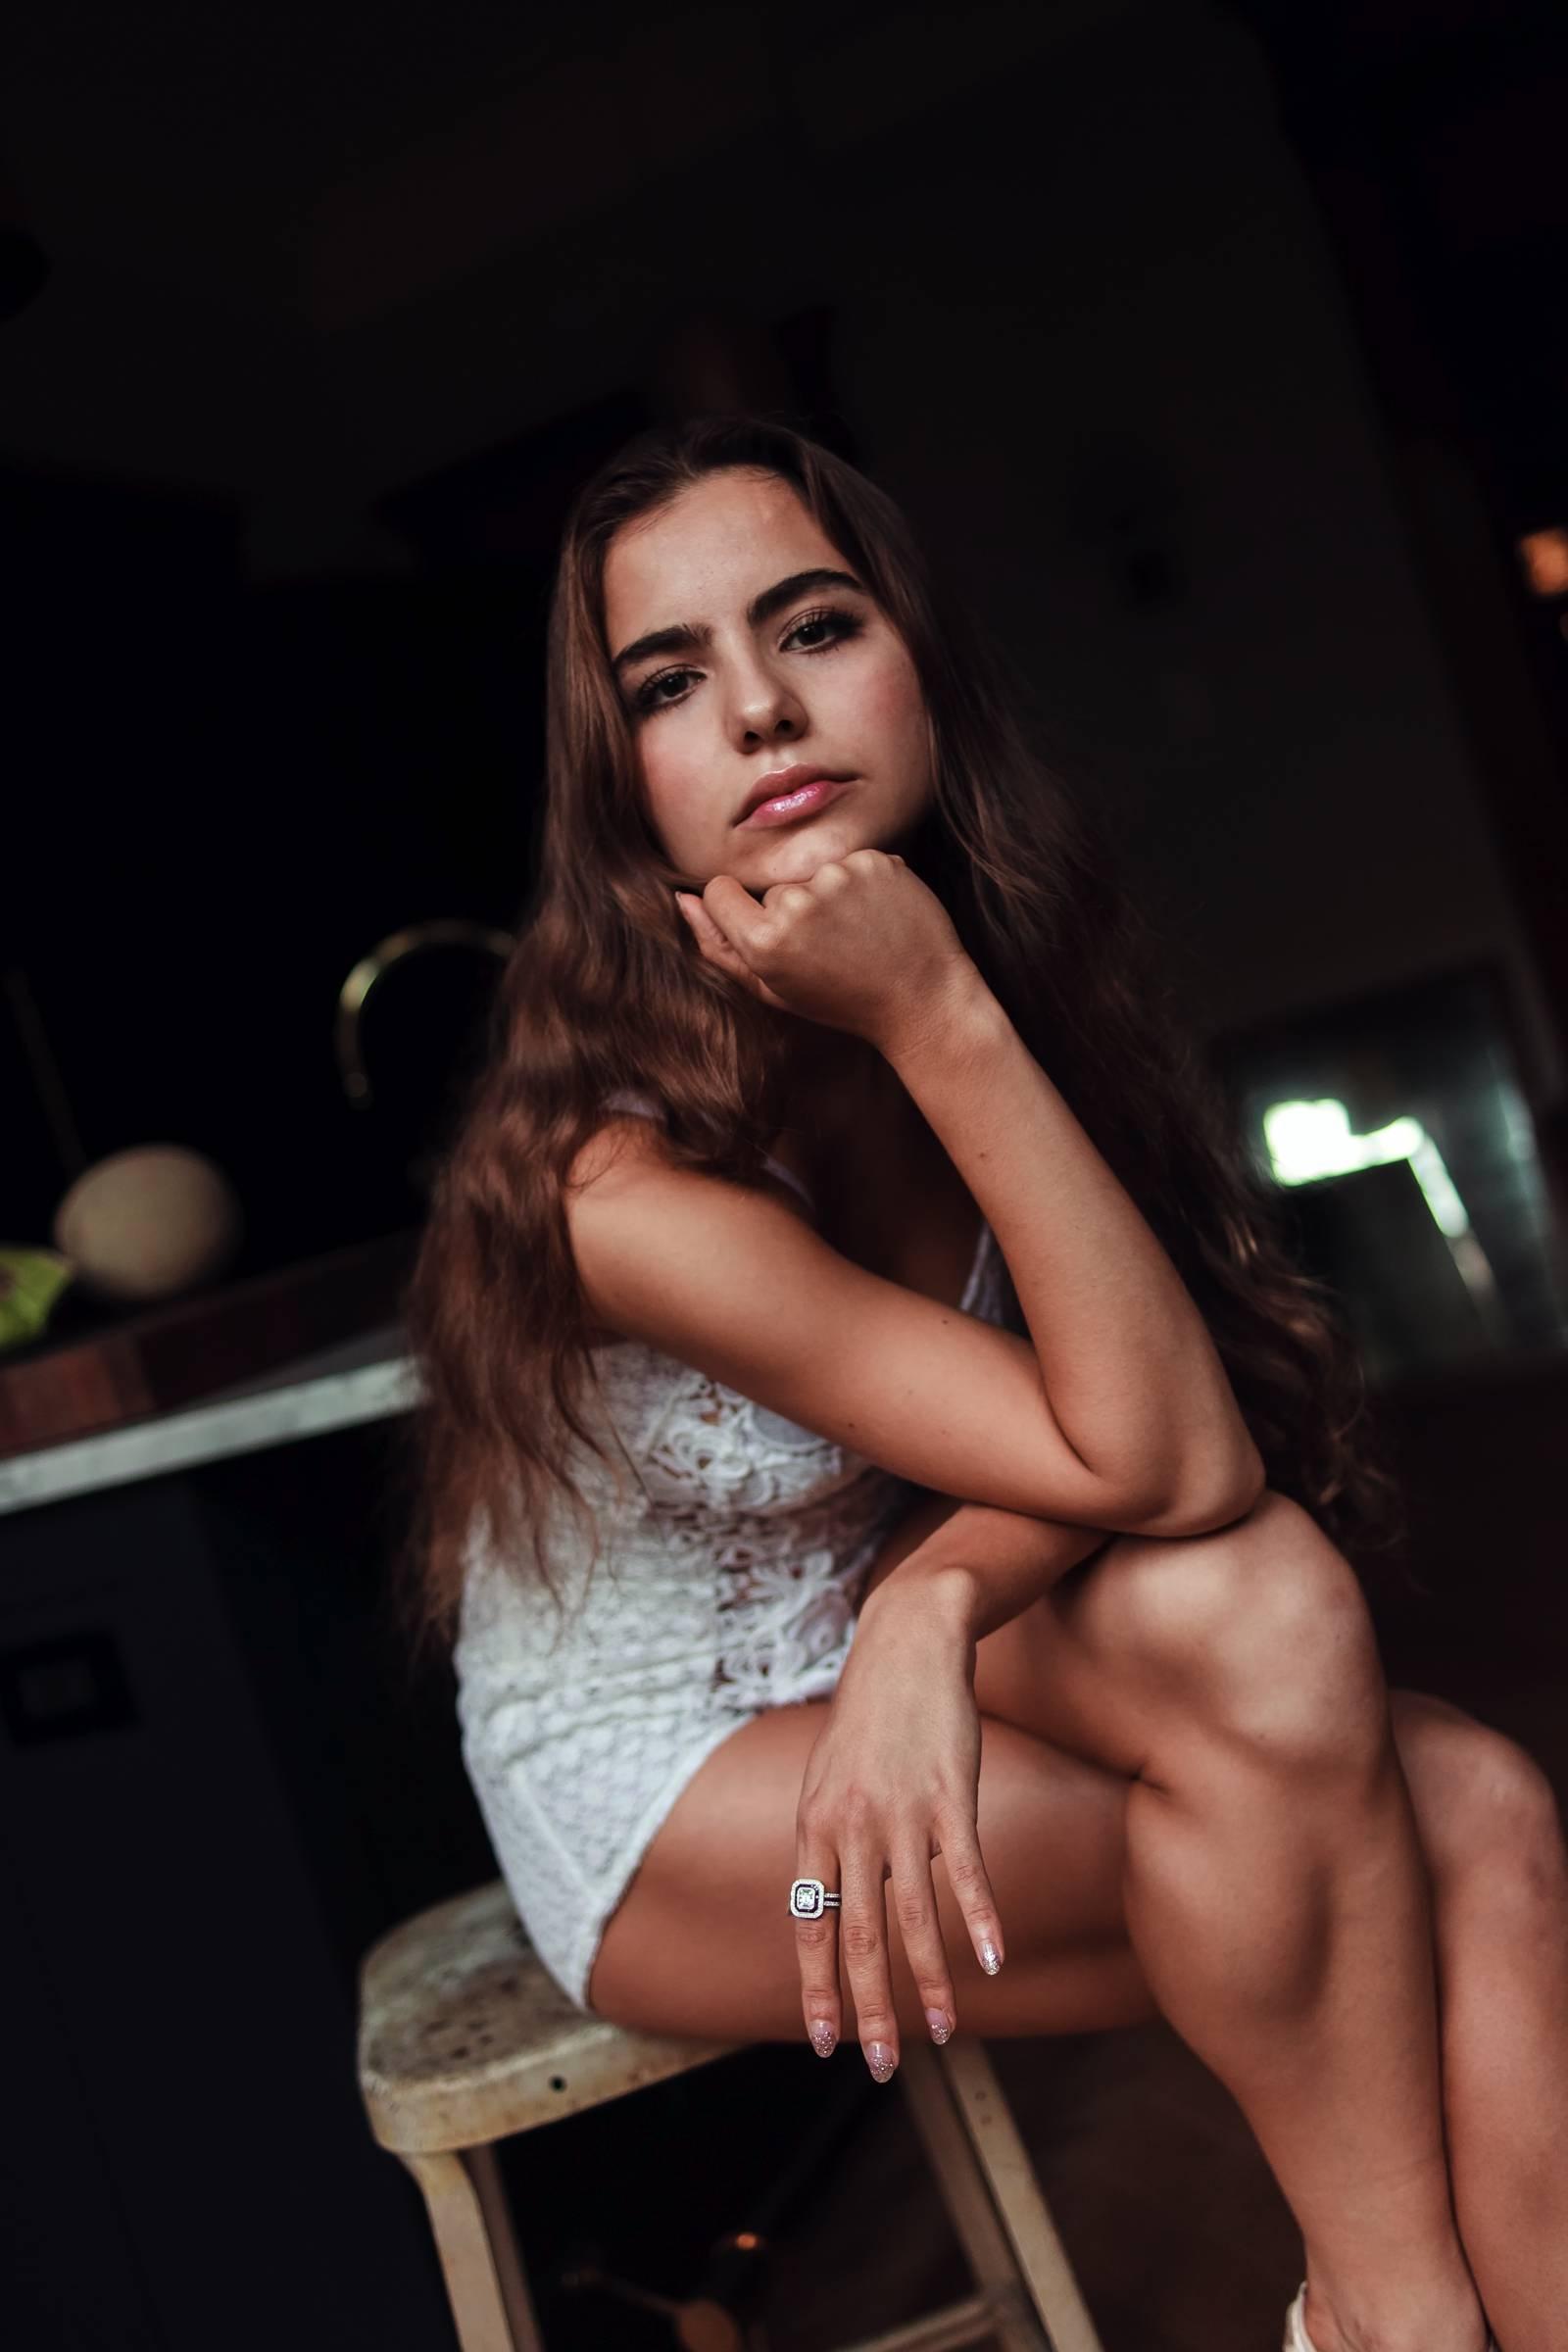 Instagram Violetta Komyshan nudes (83 foto and video), Sexy, Paparazzi, Selfie, bra 2017